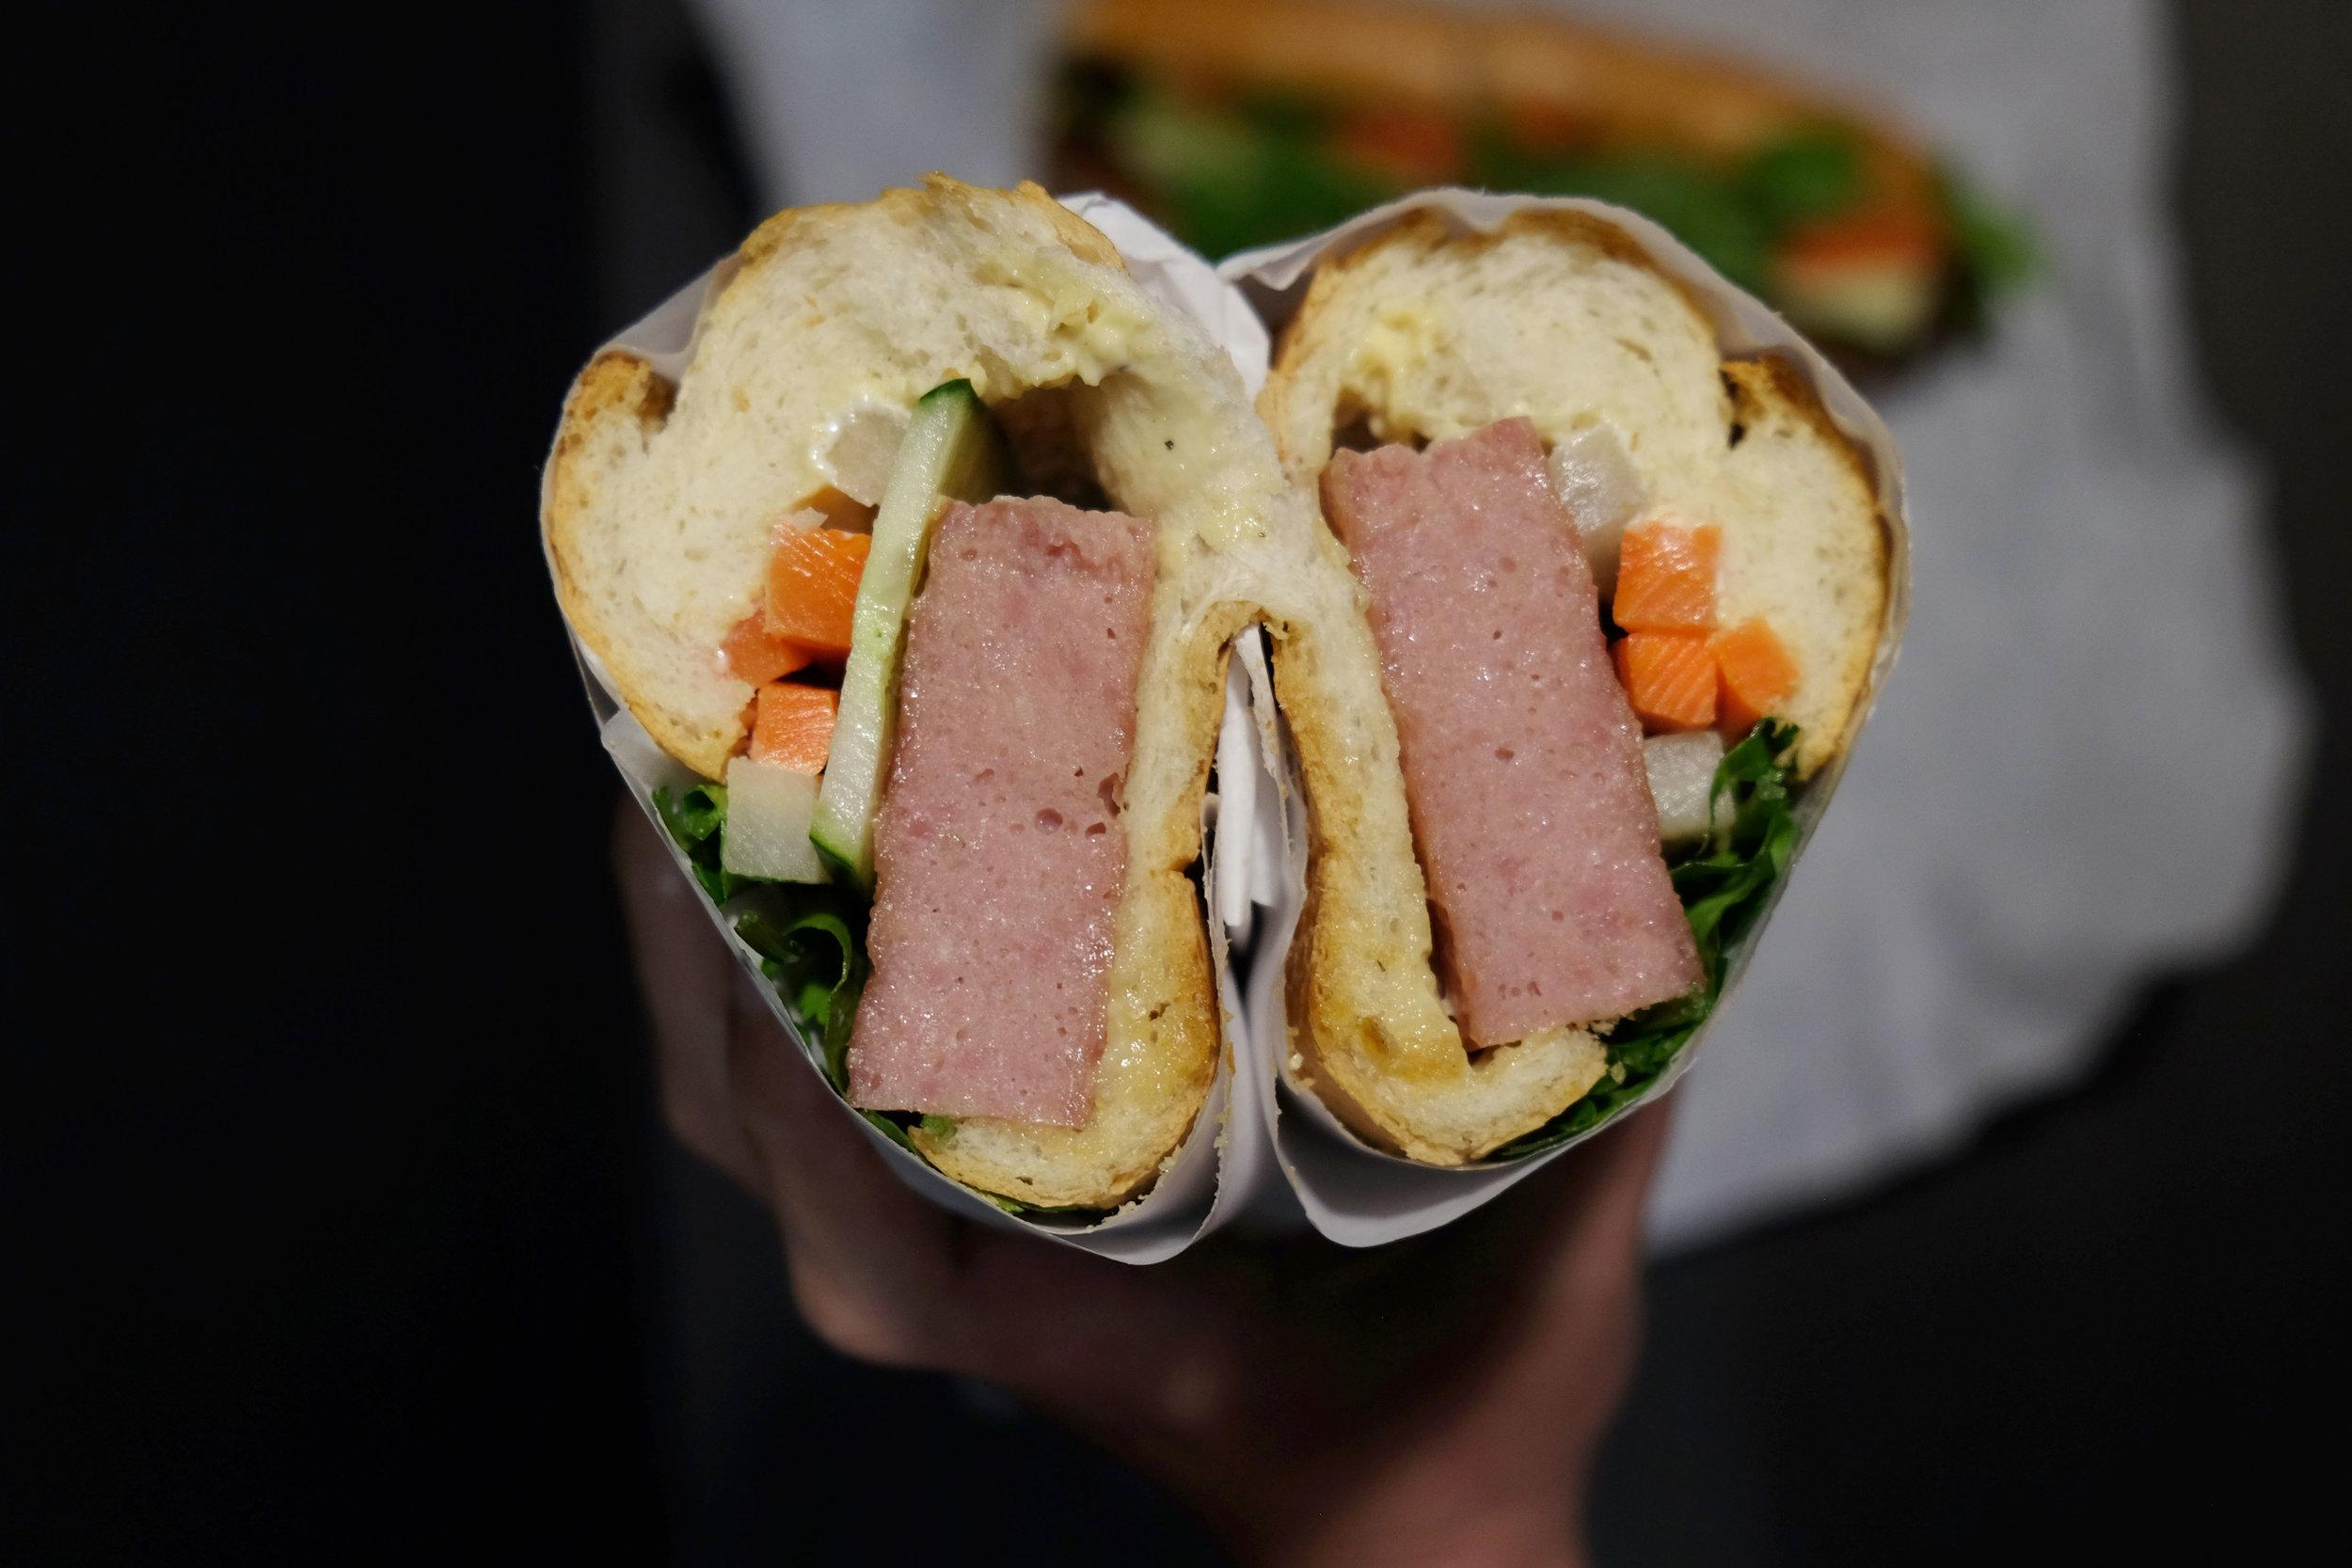 sandwich hag.jpg